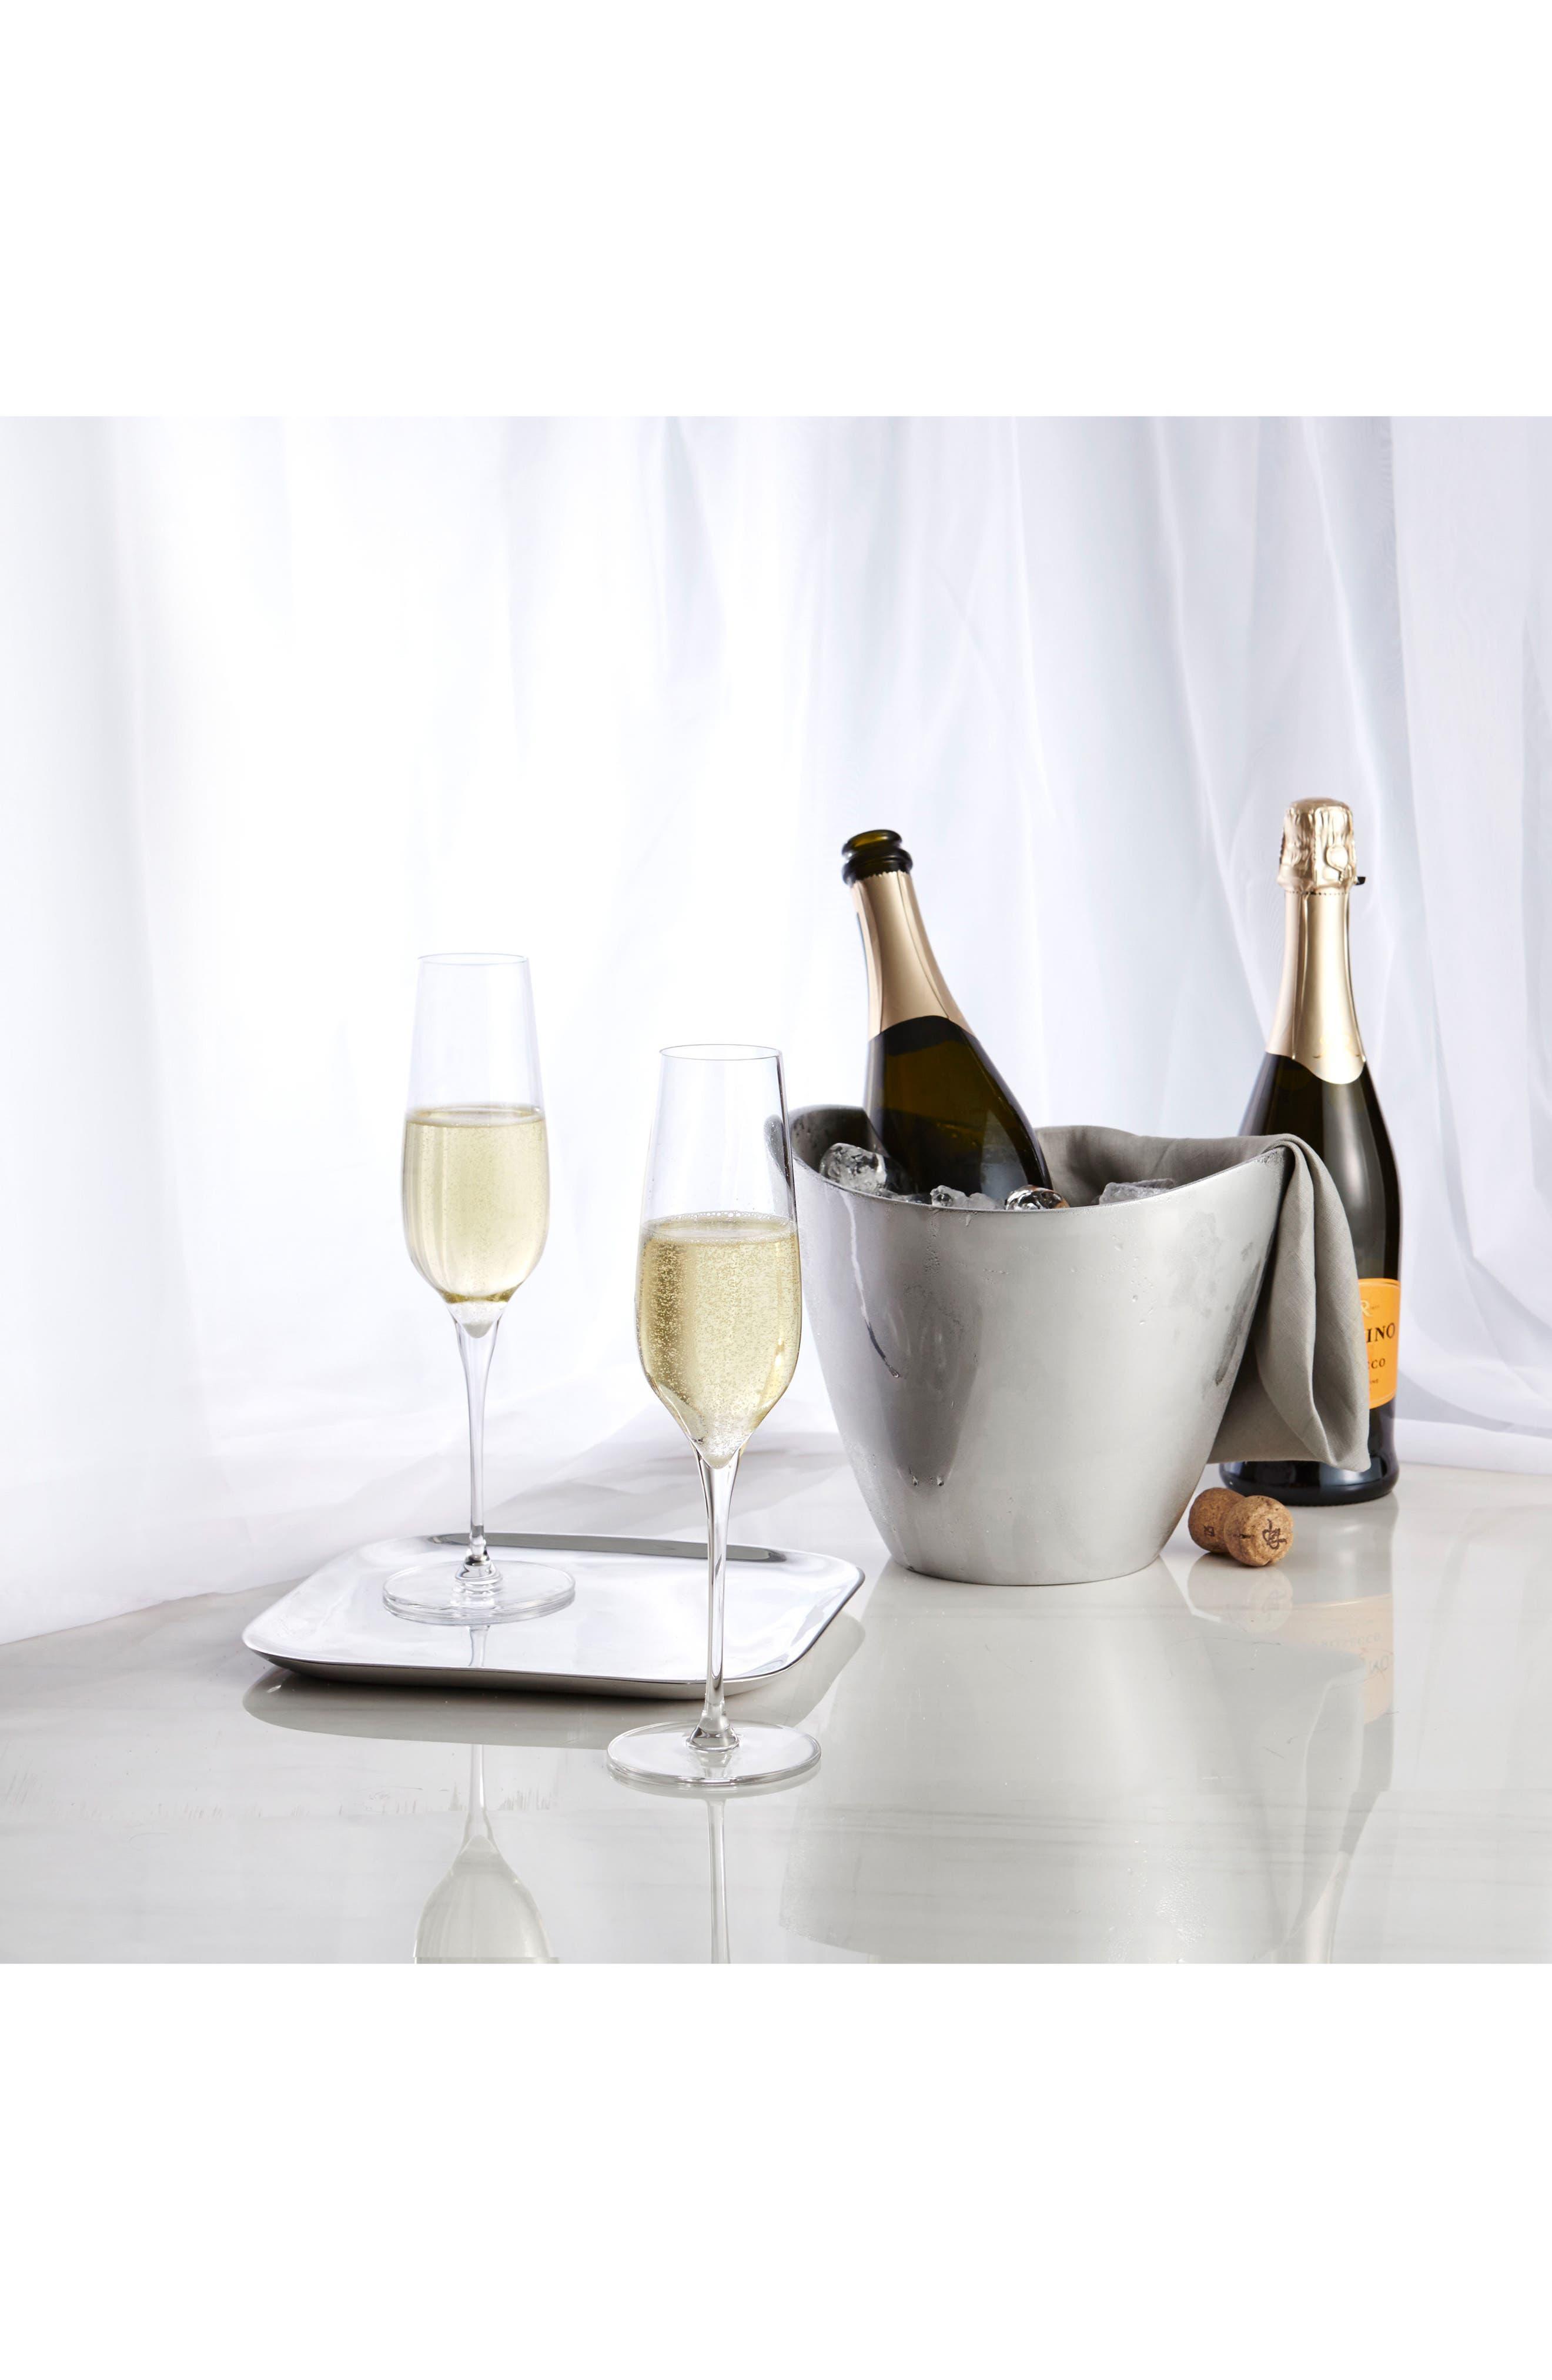 Vie Set of 2 Champagne Flutes,                             Alternate thumbnail 3, color,                             100